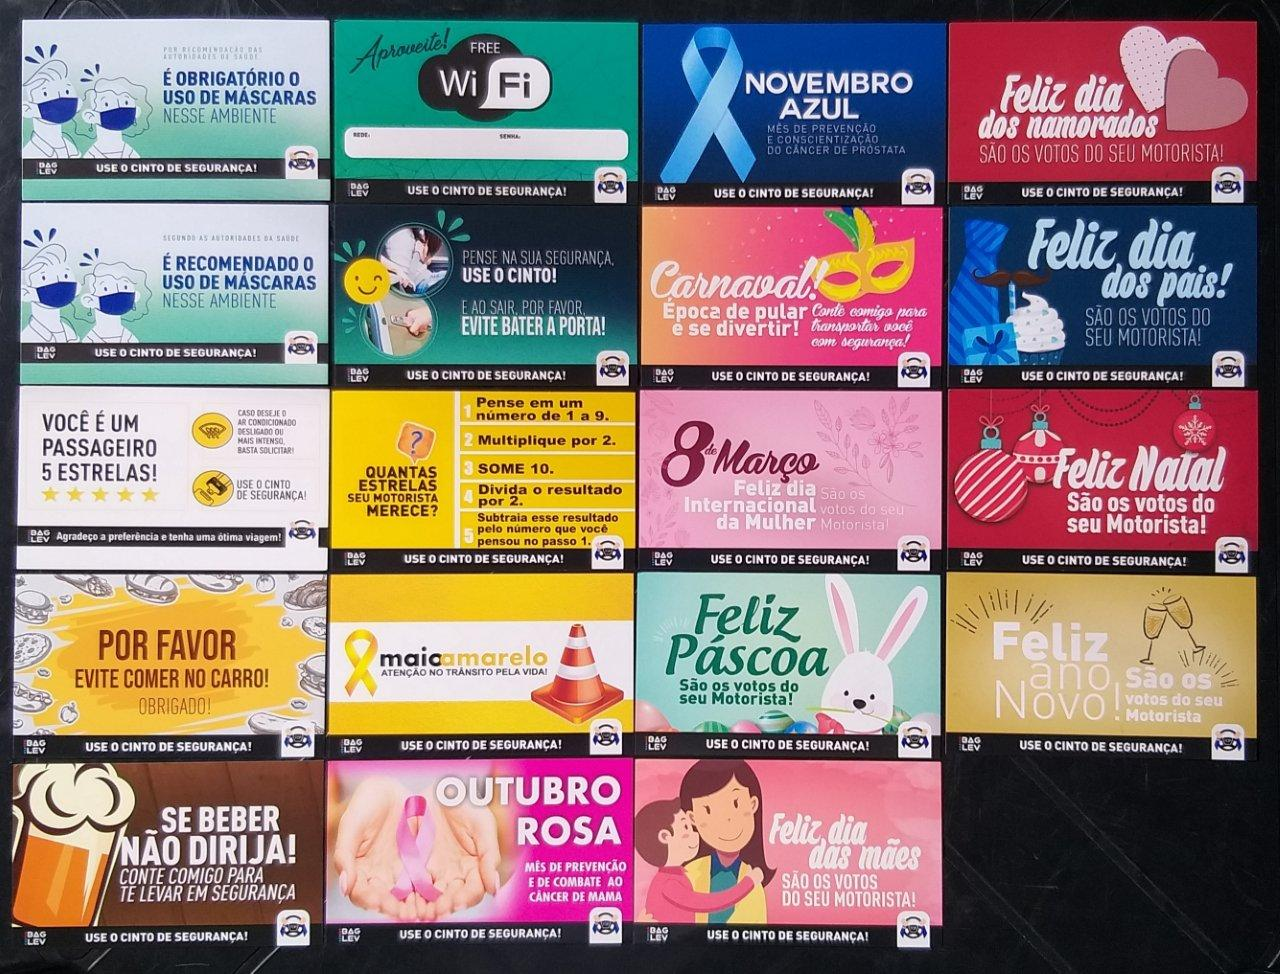 BAGLEV - Combo 1 - Bolsa Térmica TOP p/ Banco Carro + 1 Gelo Gel + 1 Capa Universal p/ Cabeceira + 1 Kit c/ 20 Informativos